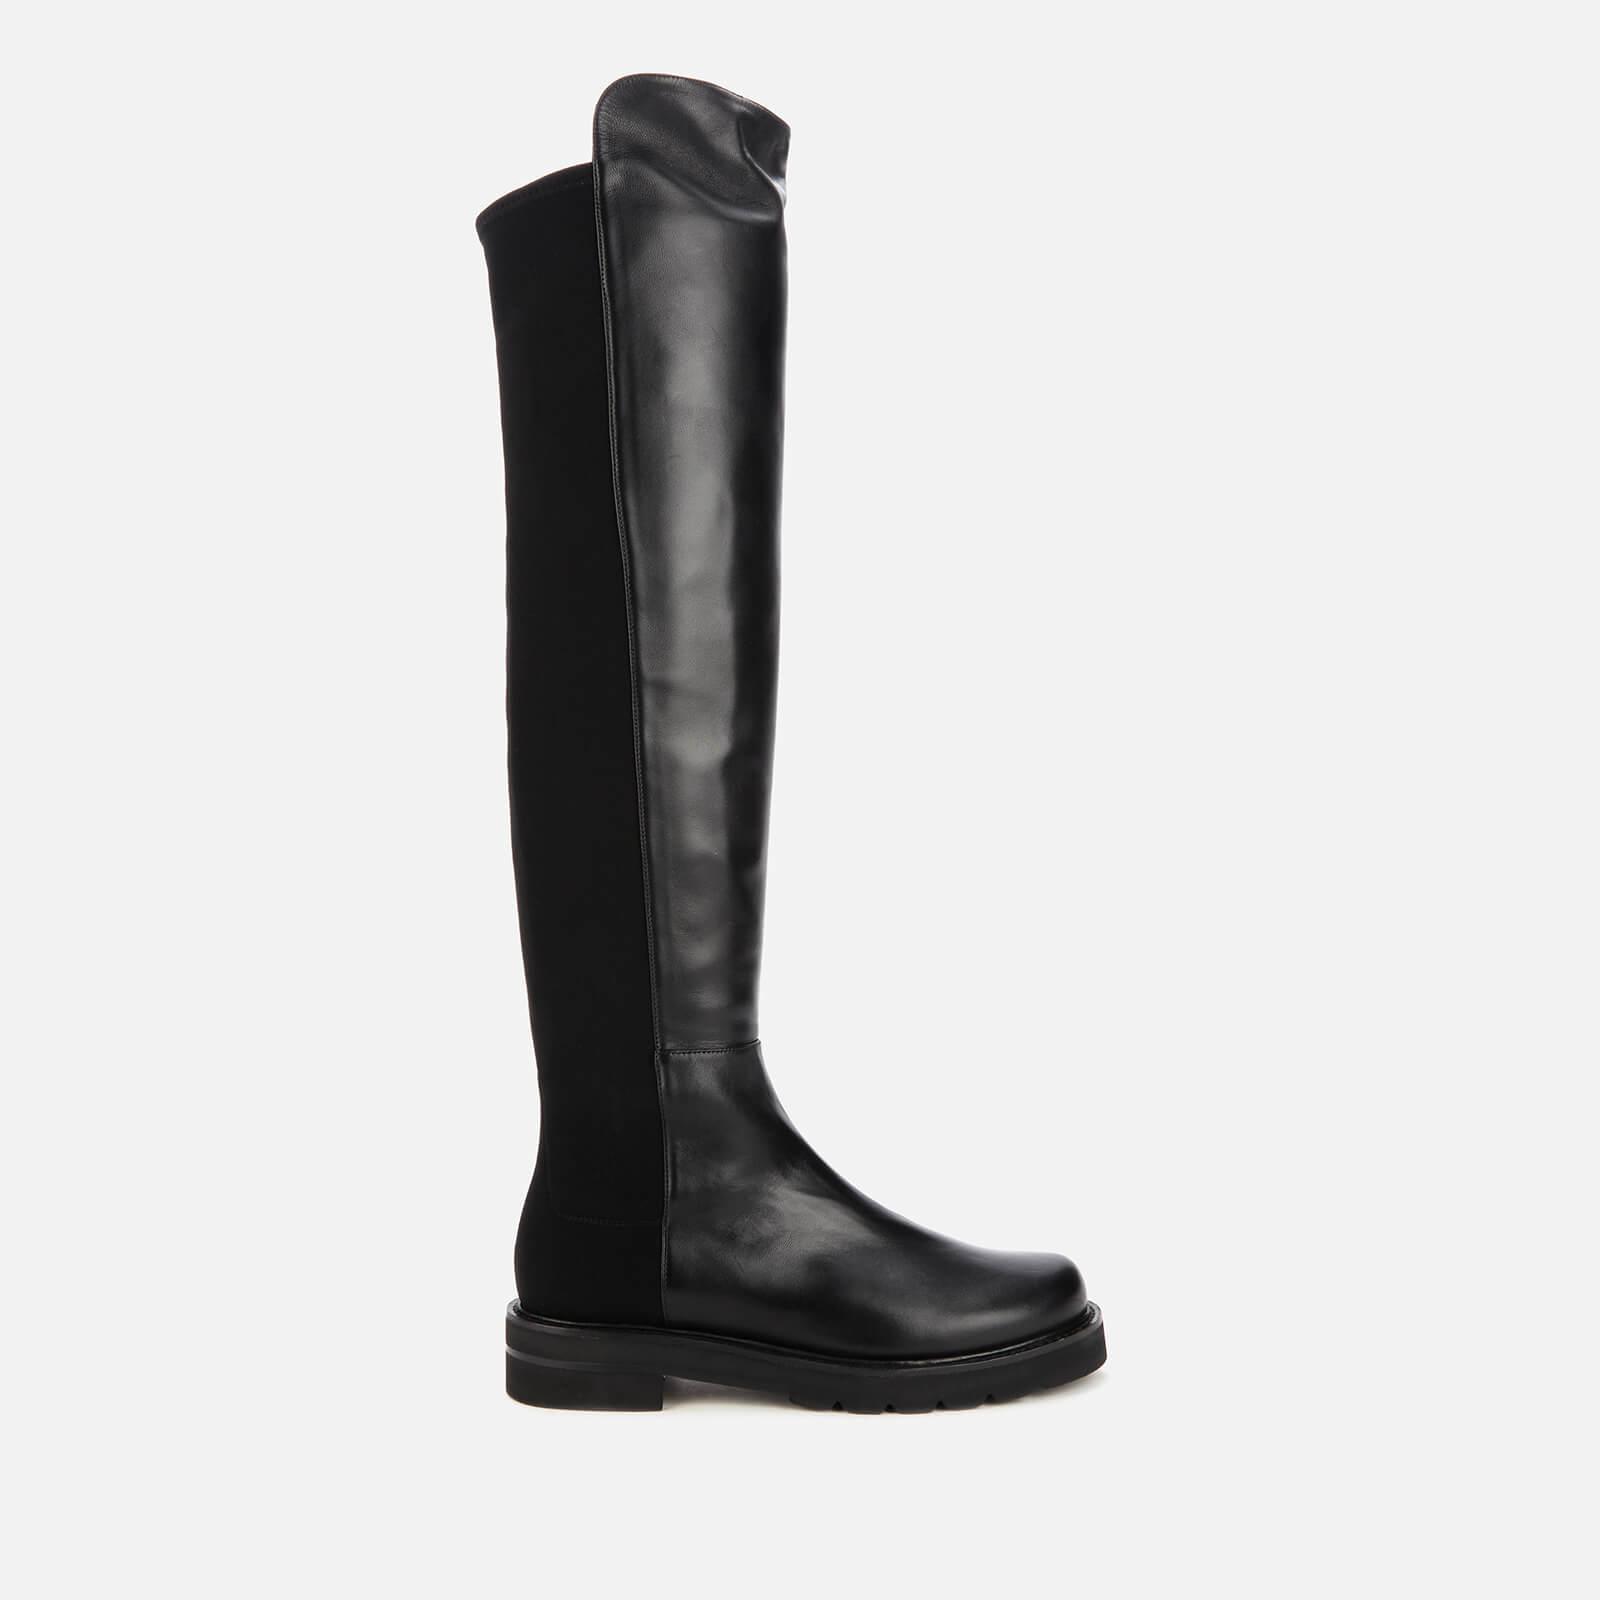 Stuart Weitzman Women's 5050 Lift Leather Over The Knee Boots - Black - Uk 6